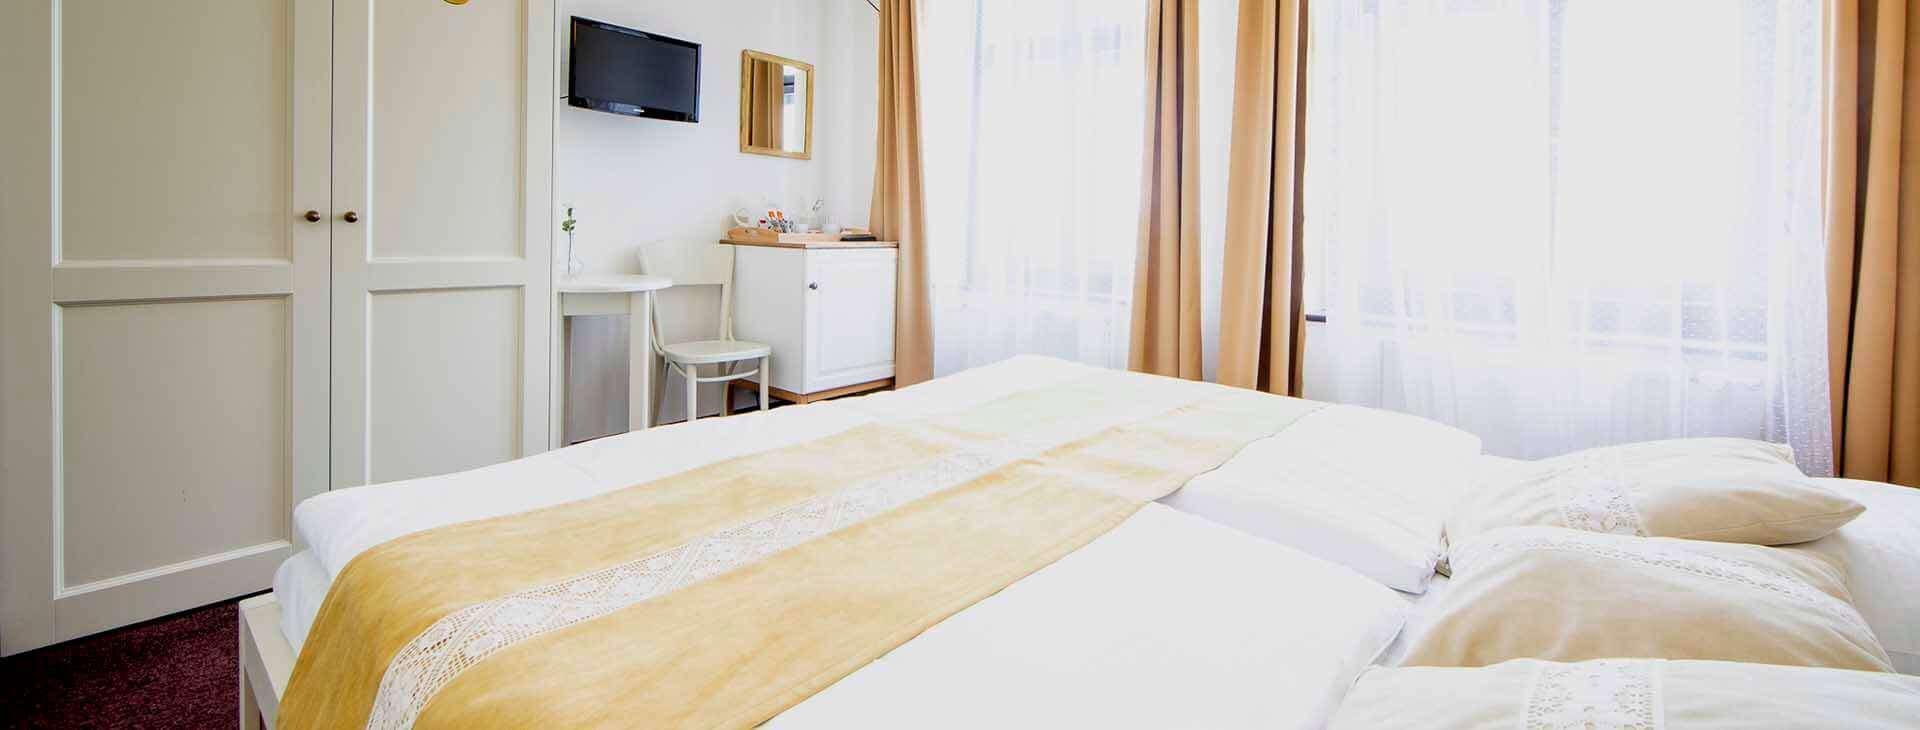 amadeus-hotel-prague-double-1920×730-2